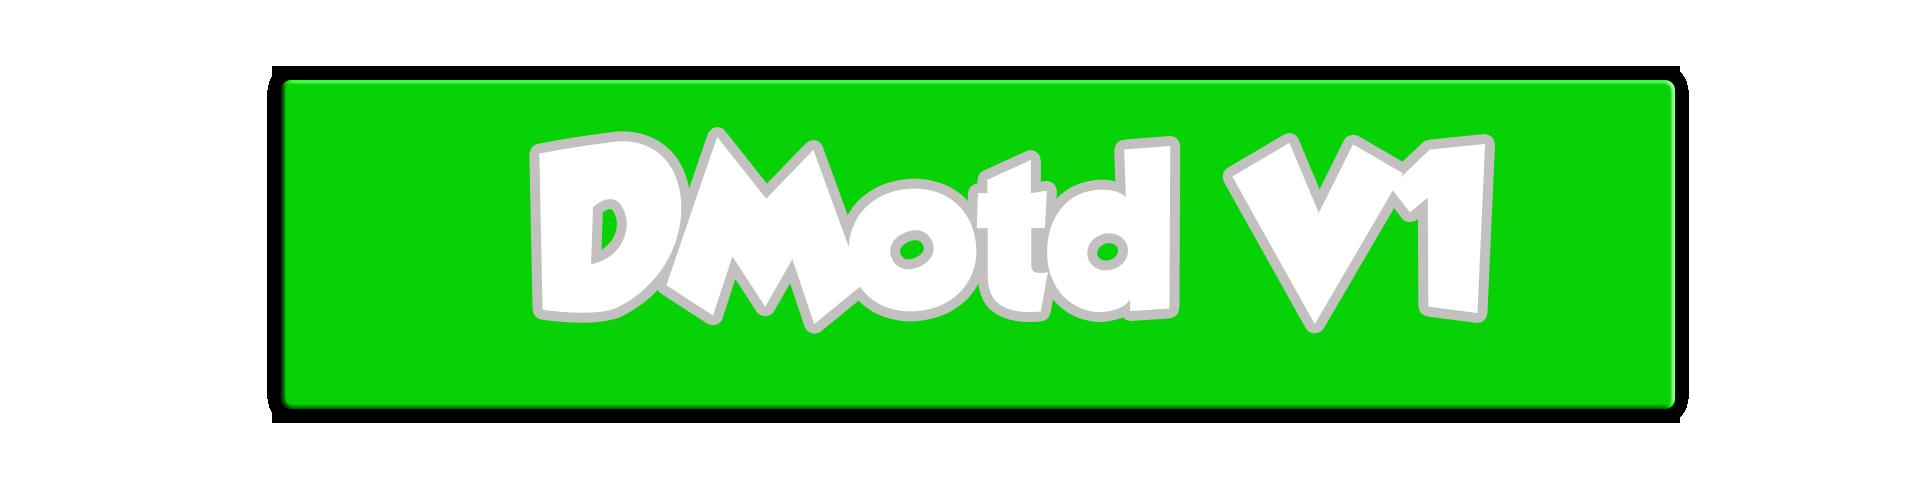 dmotd1.png